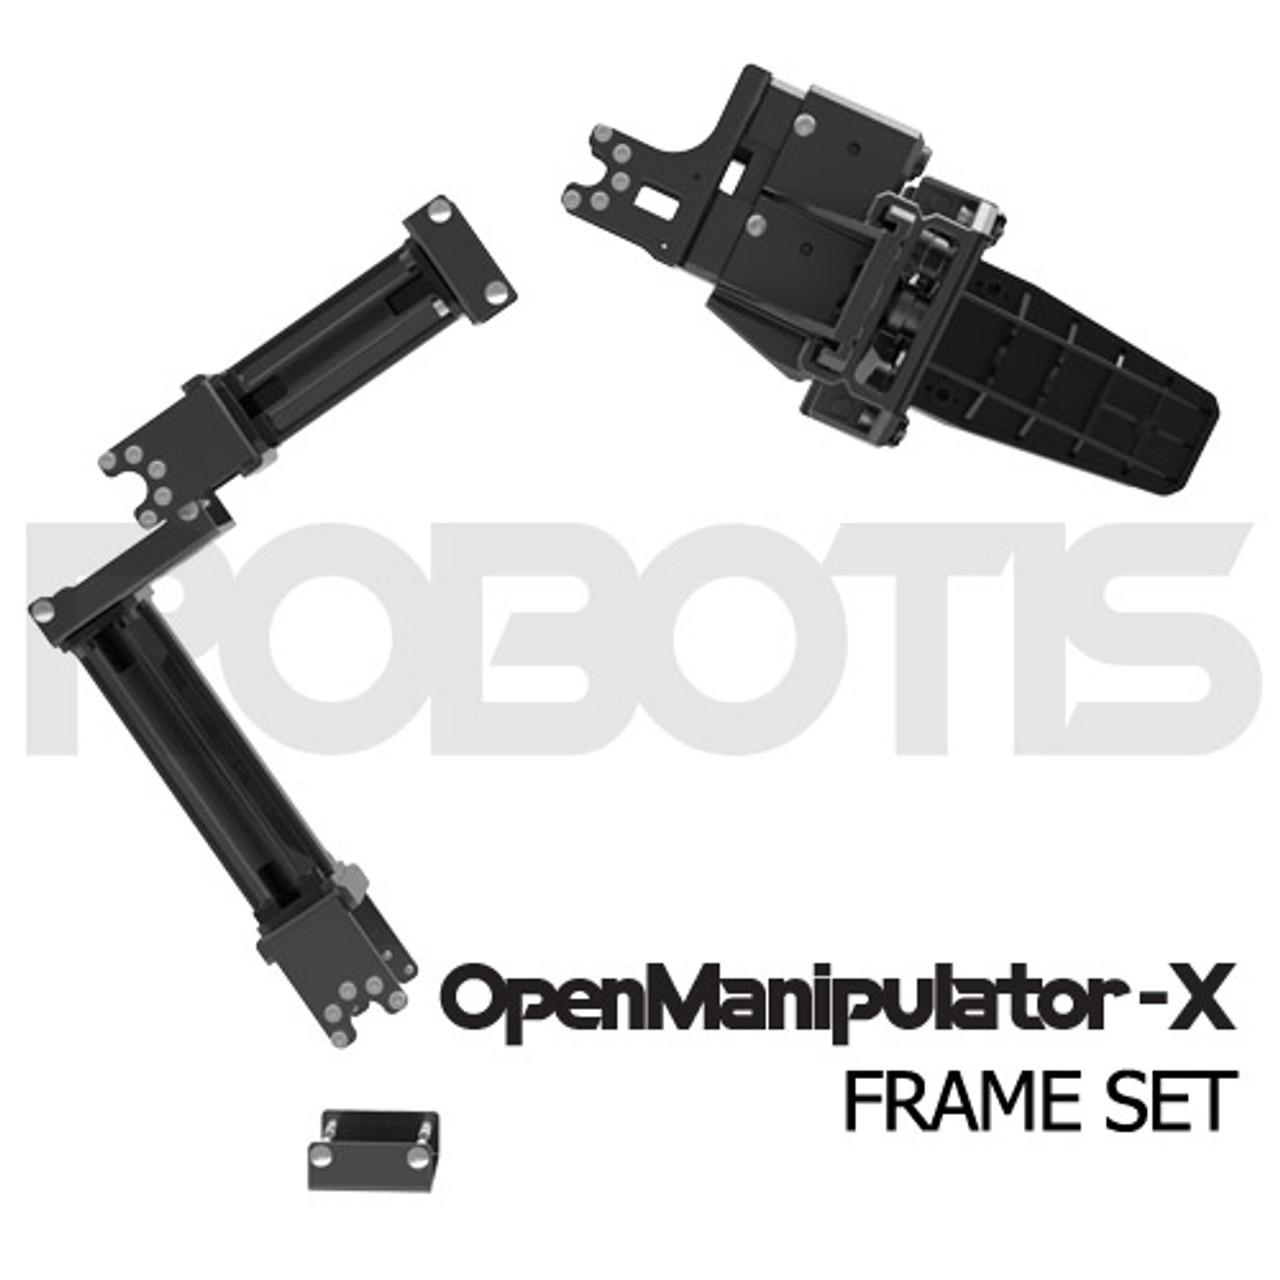 OpenManipulator-X Frame Set (RM-X52)